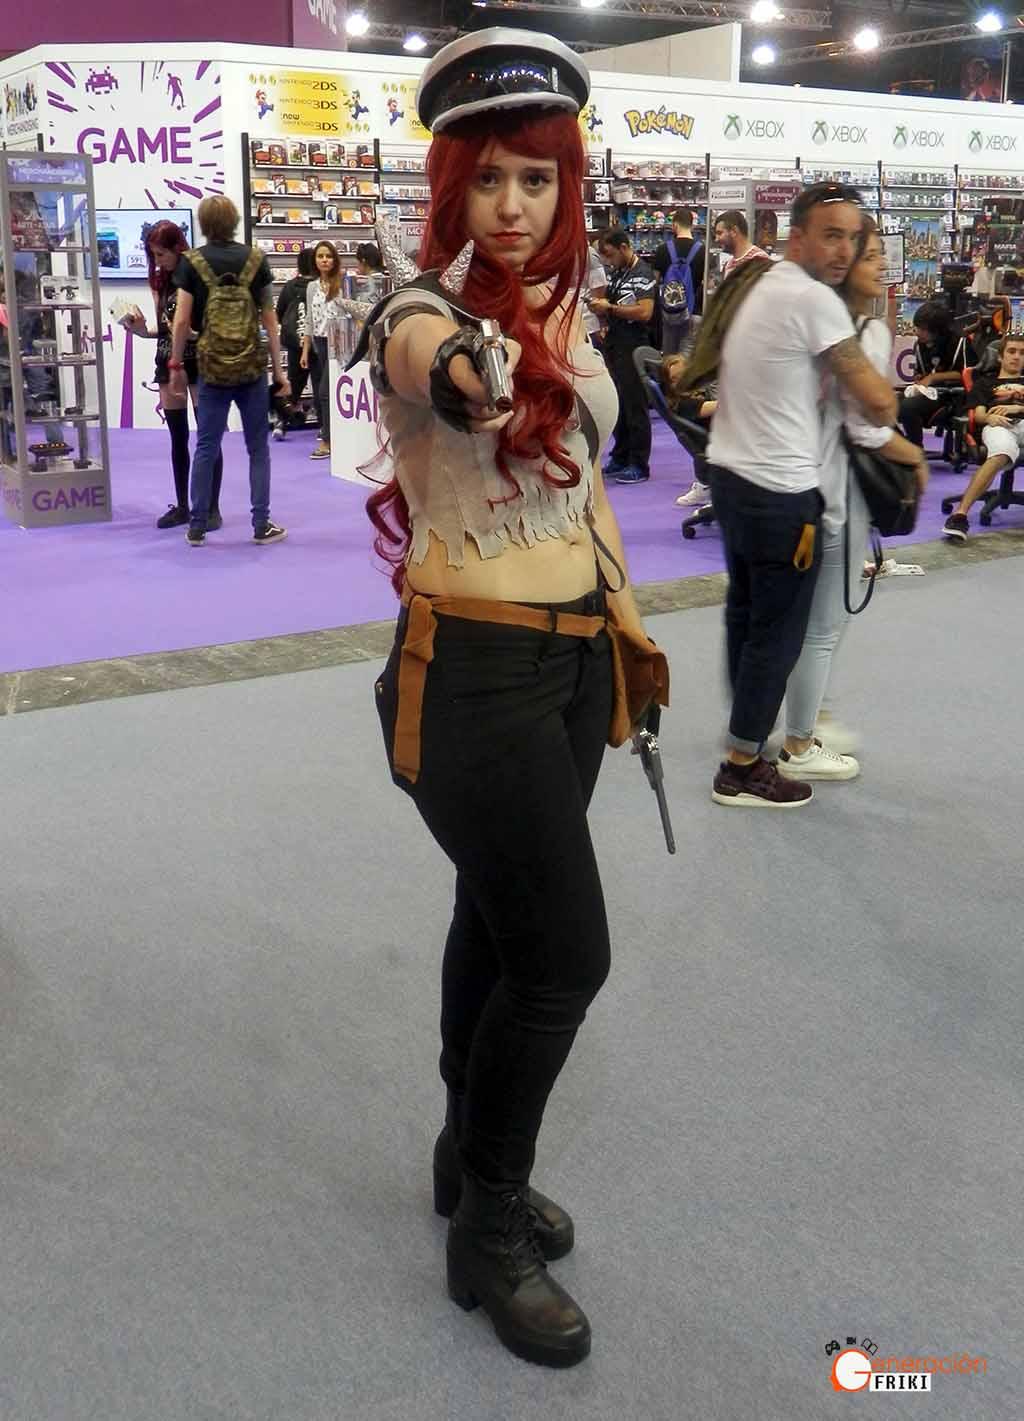 Madrid-Gaming-Experience-2017-Cosplay-Miss-Fortune-Guerrera-de-carretera-(LOL)